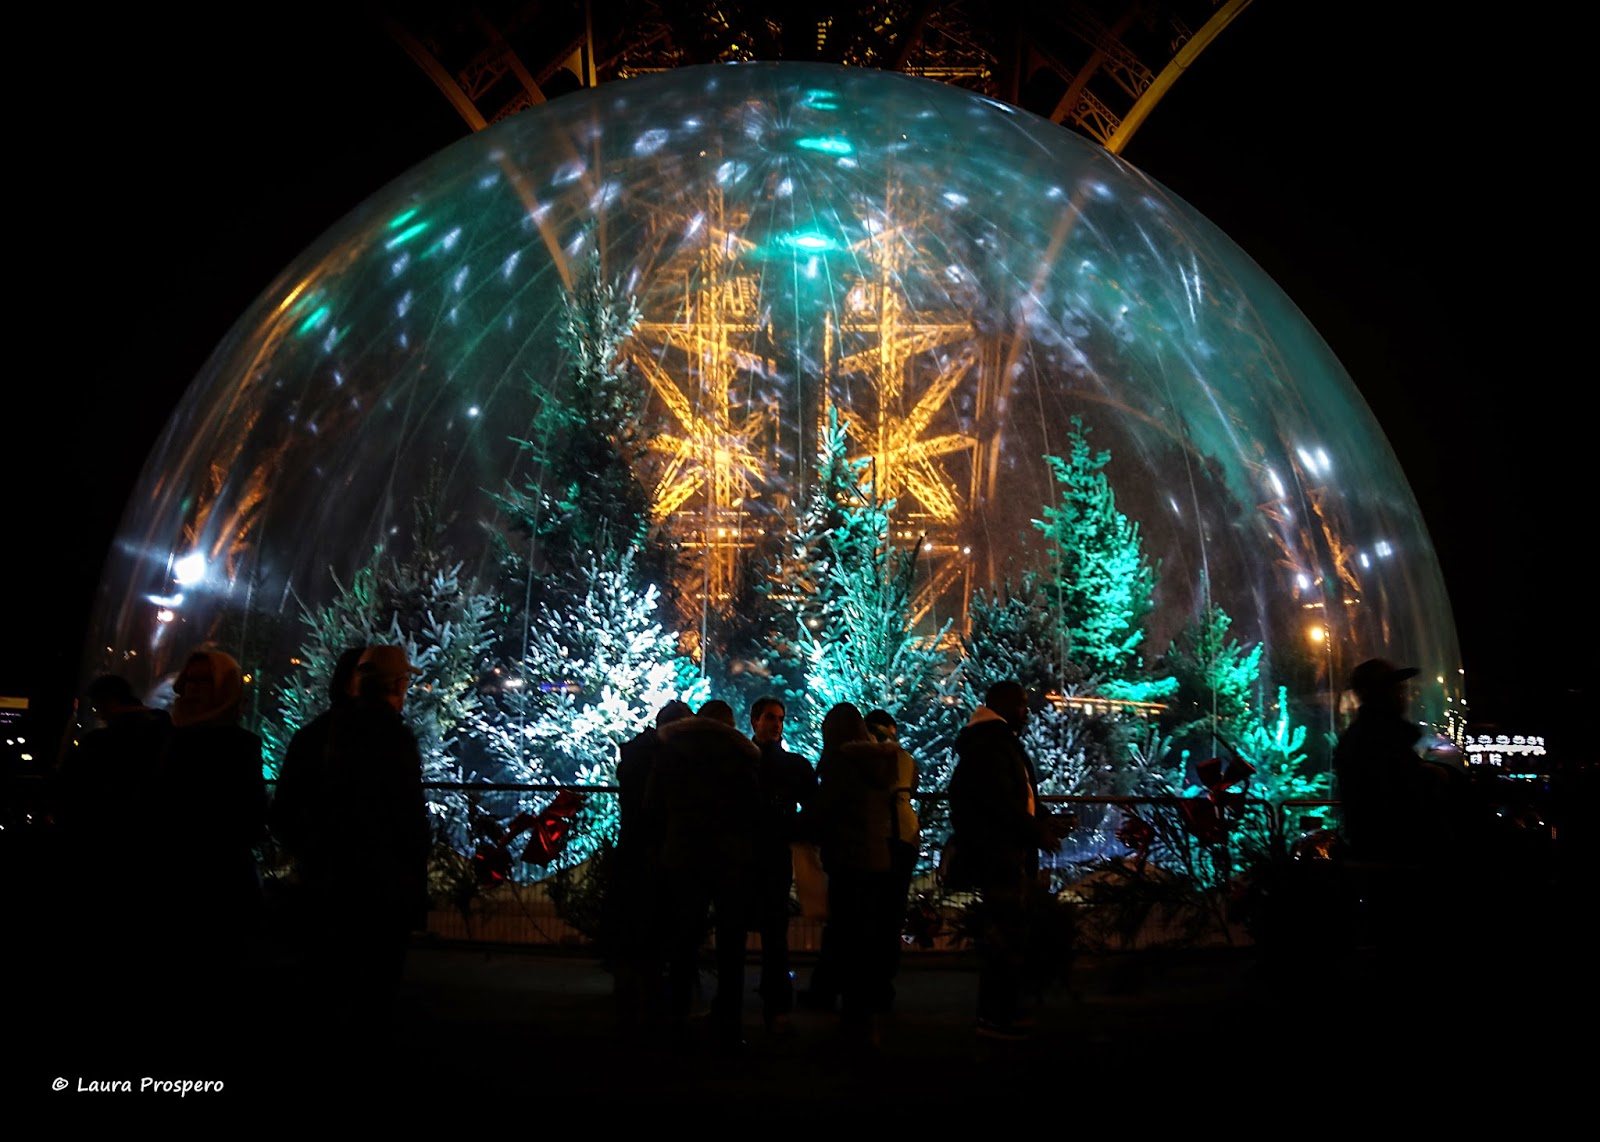 tour eiffel e sua bola de neve © Laura Prospero - illuminations Pierre Bideau